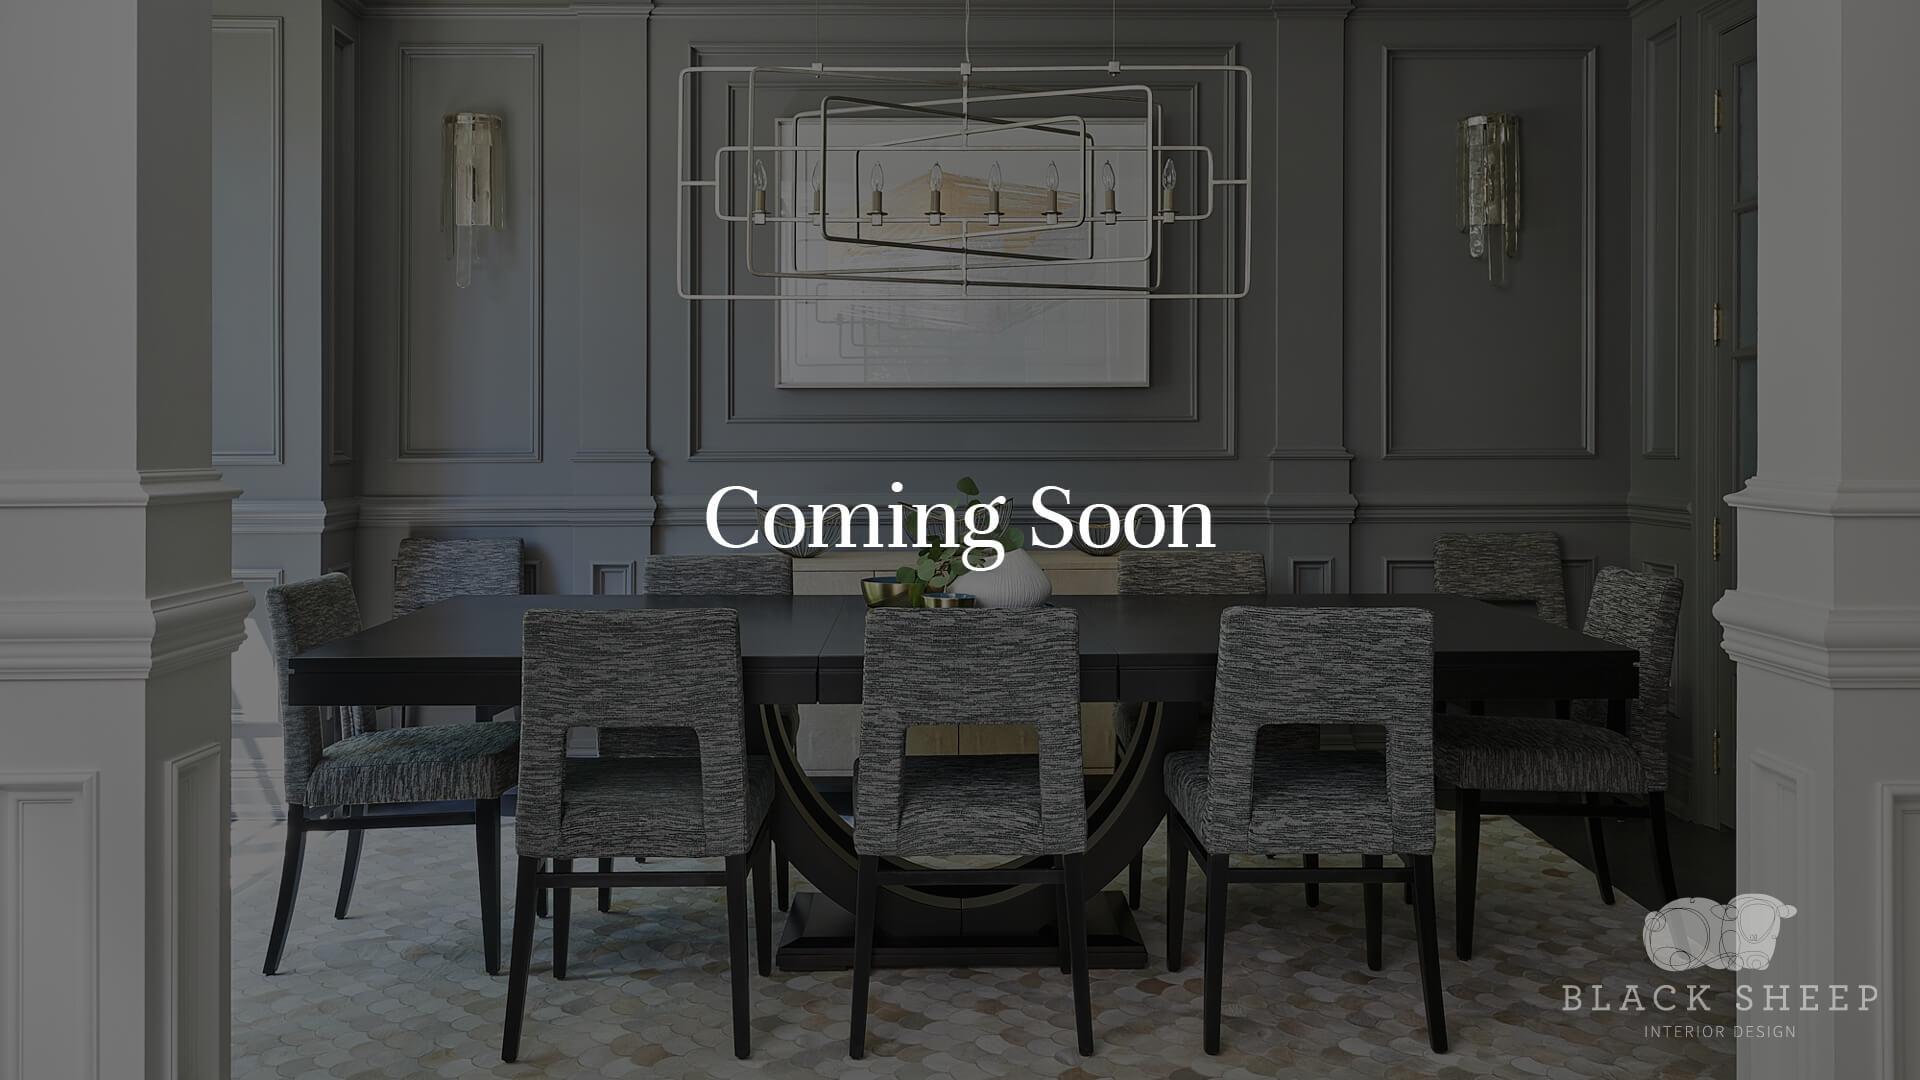 Black Sheep Interior Design St Leonards Coming Soon